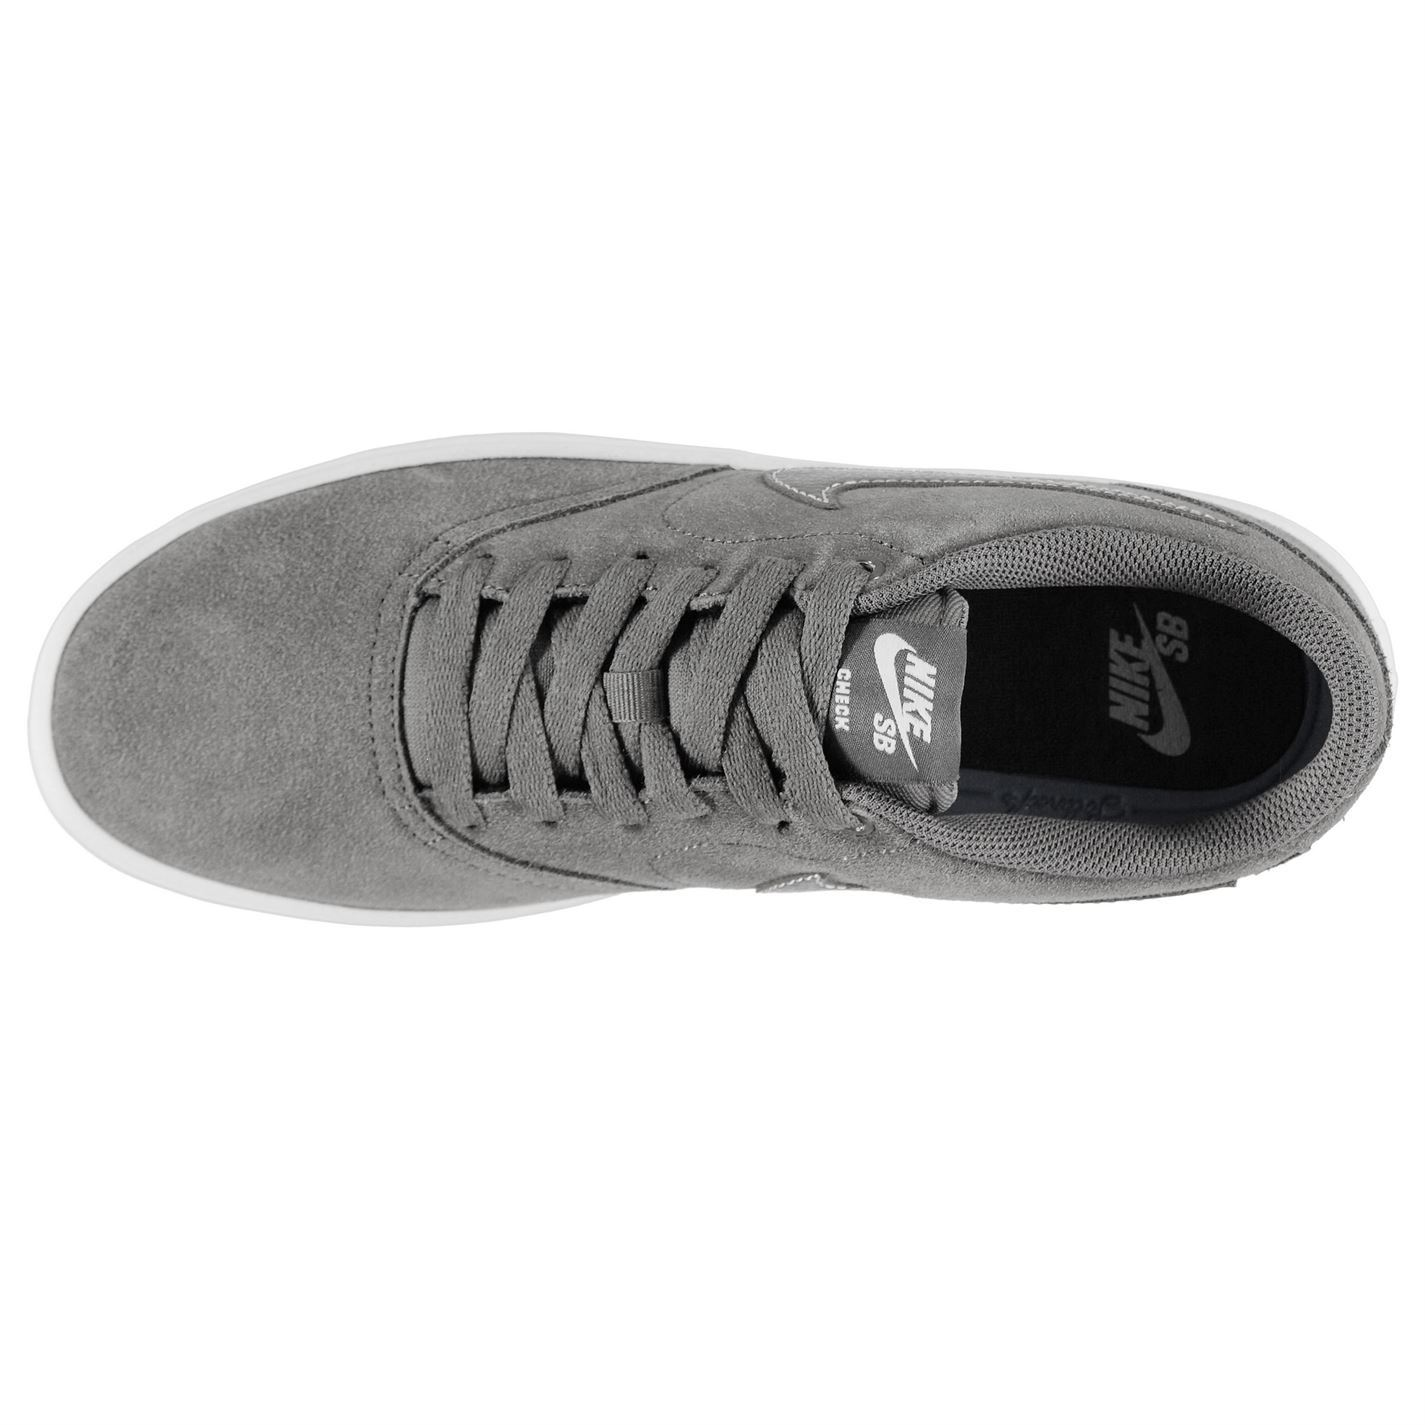 aced45b81a79 Nike SB Check Solar Skate Shoes Mens DkGrey Grey Trainers Footwear ...